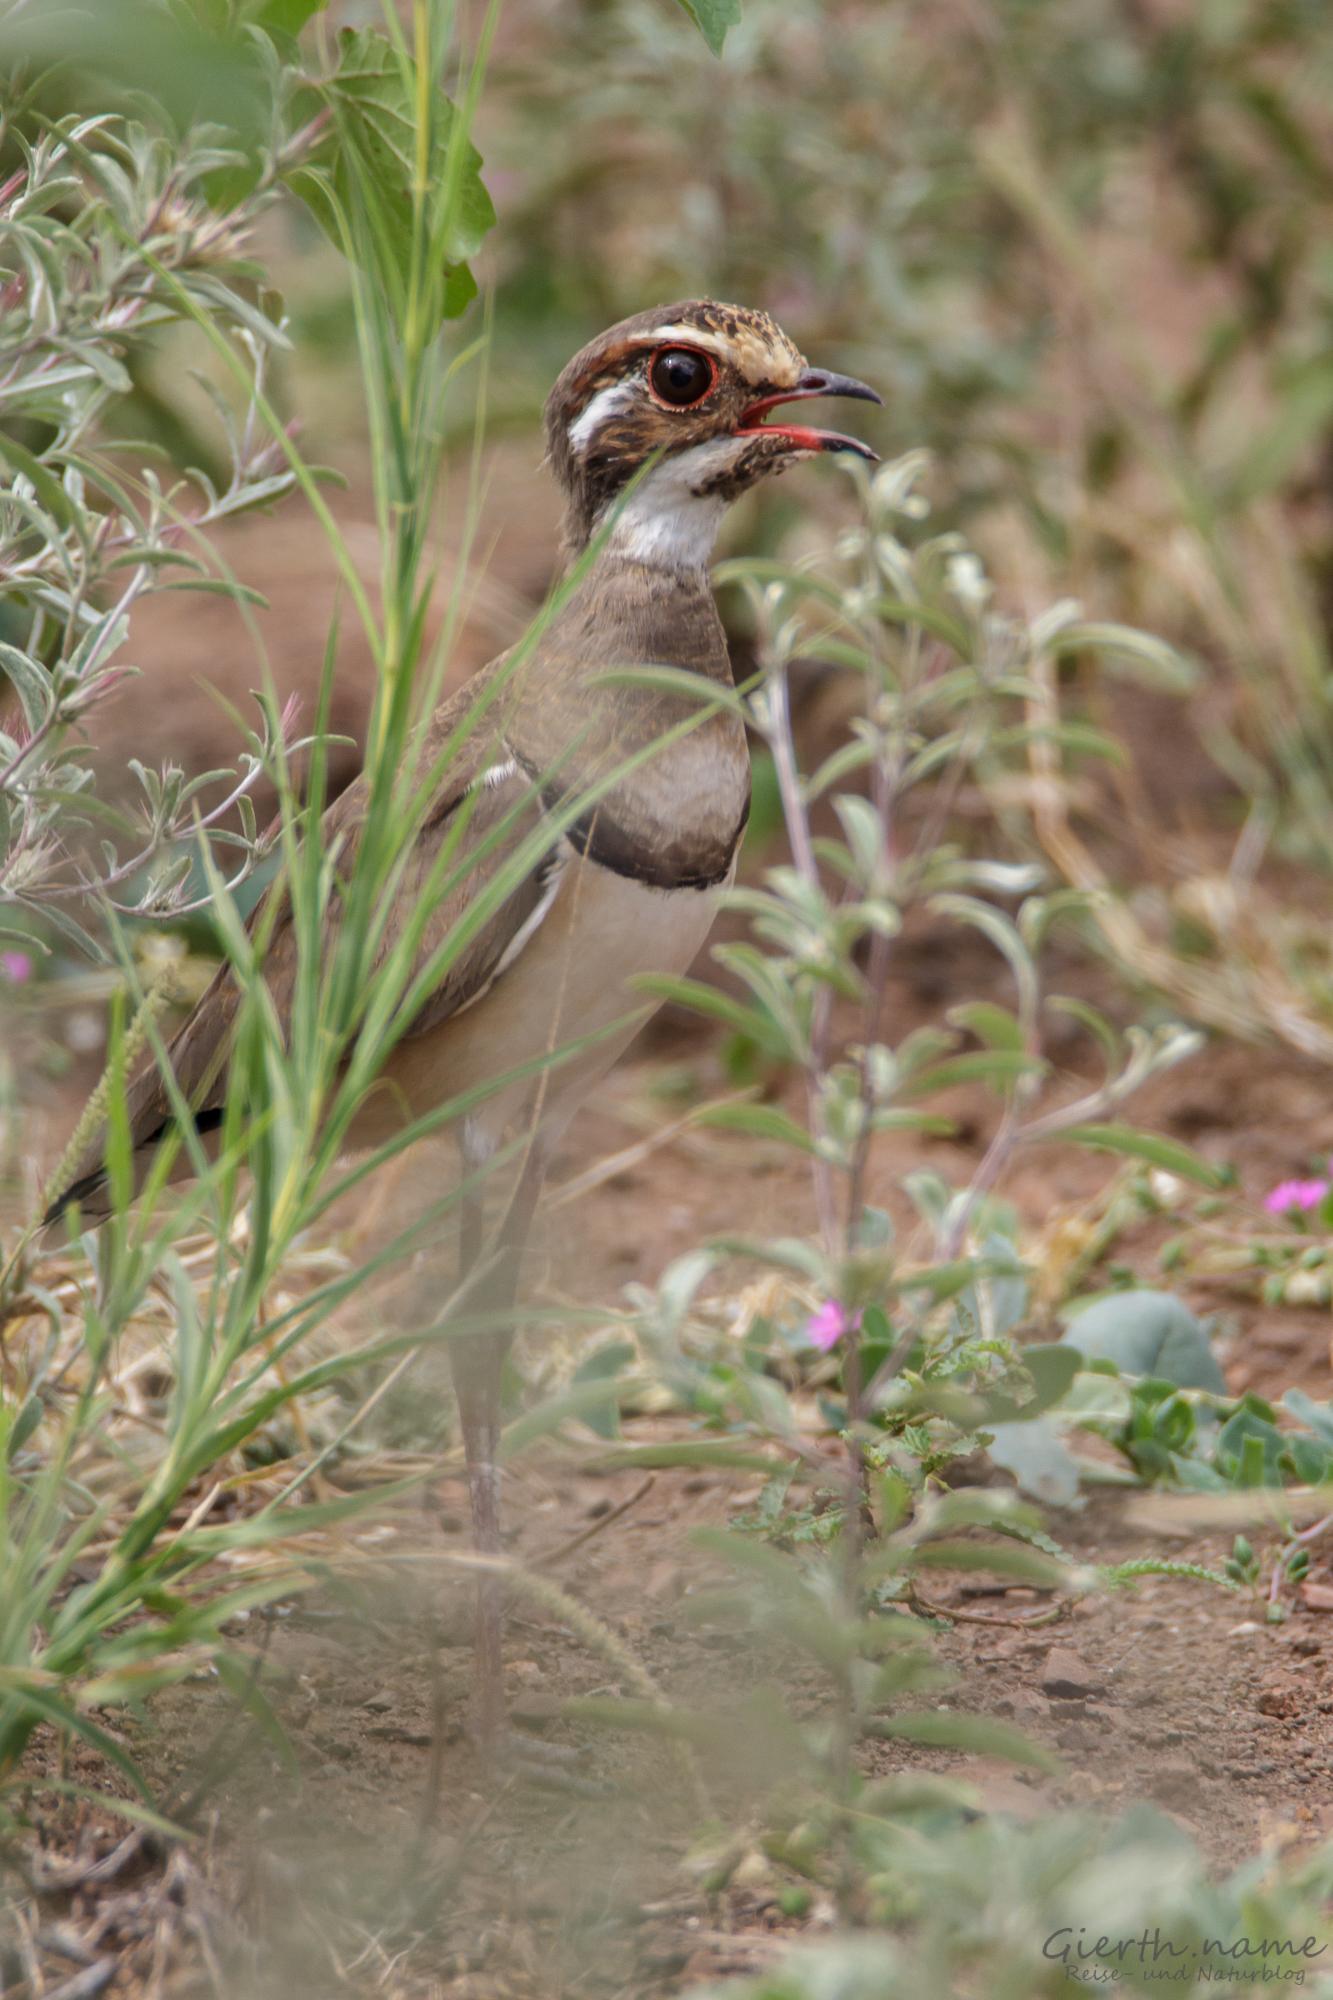 Amethystrennvogel - Bronze-winged coursor - Rhinoptilus chalcopterus